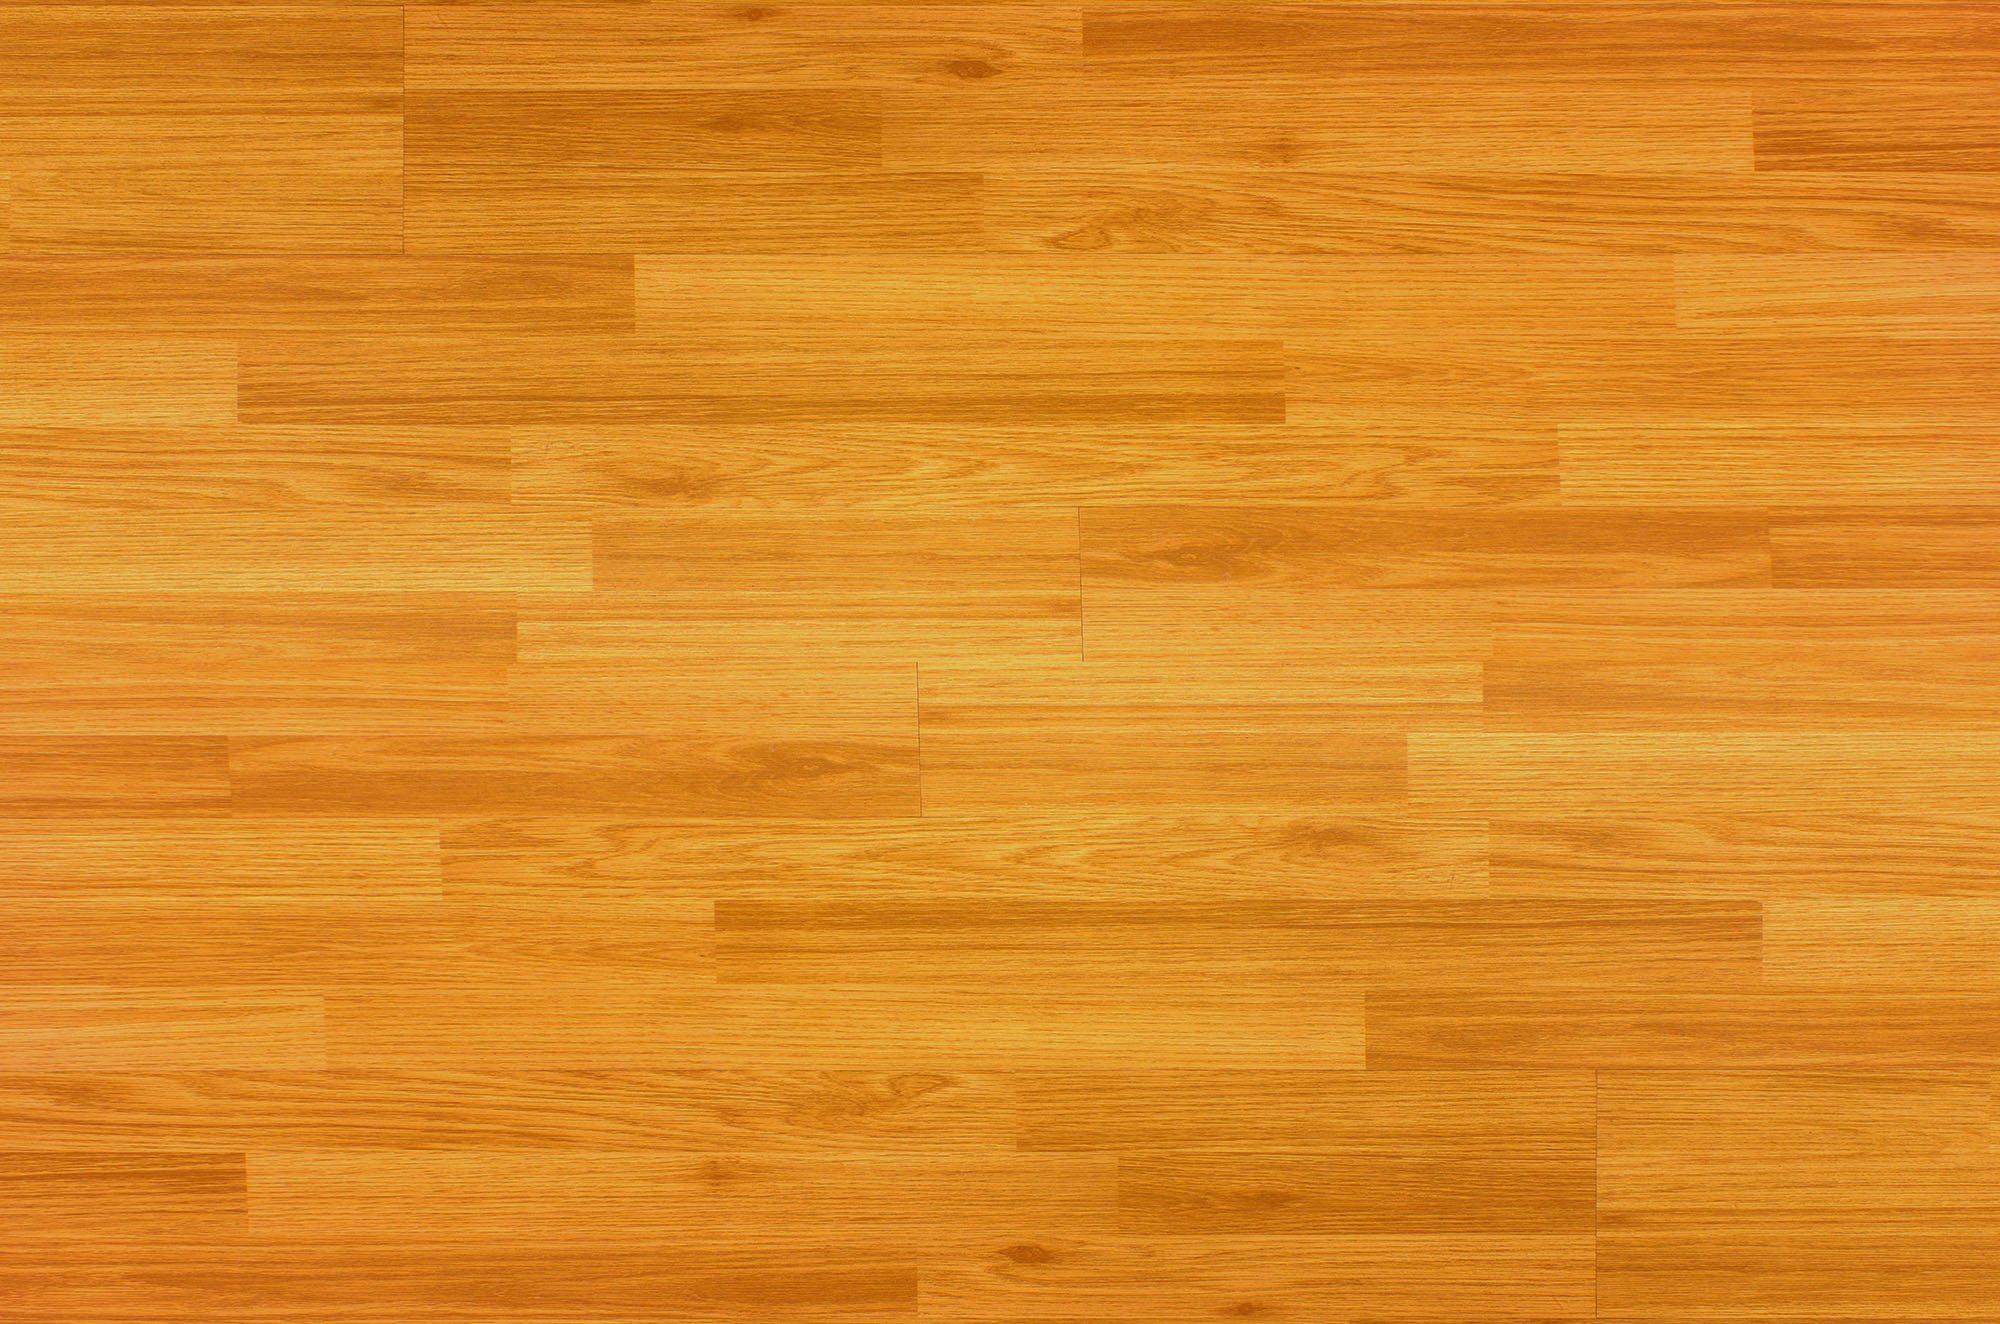 texture wood background pattern wood Hardwood maple basketball c ...